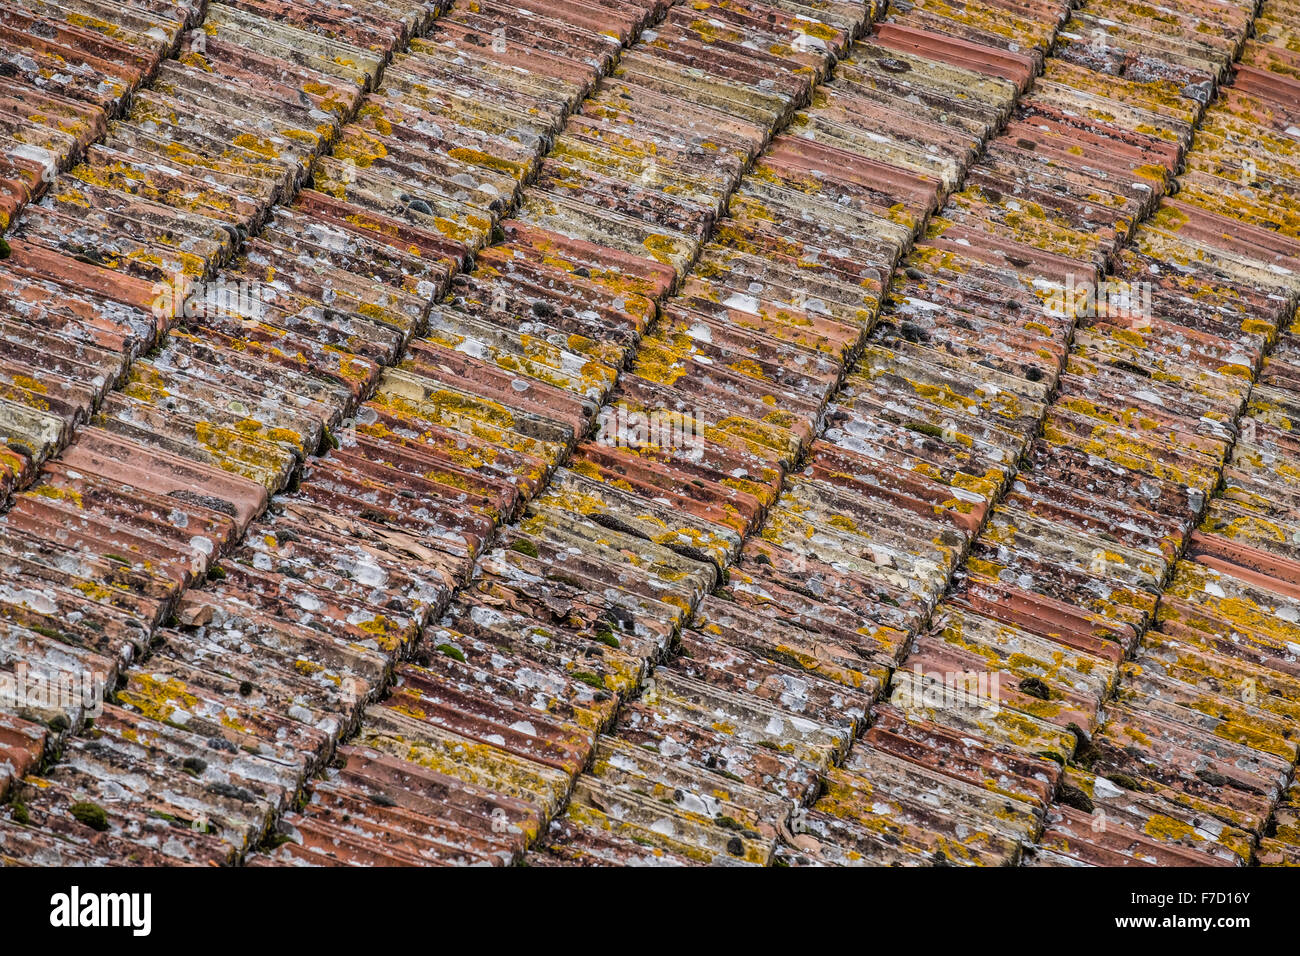 Italian rooftop tiles - Stock Image